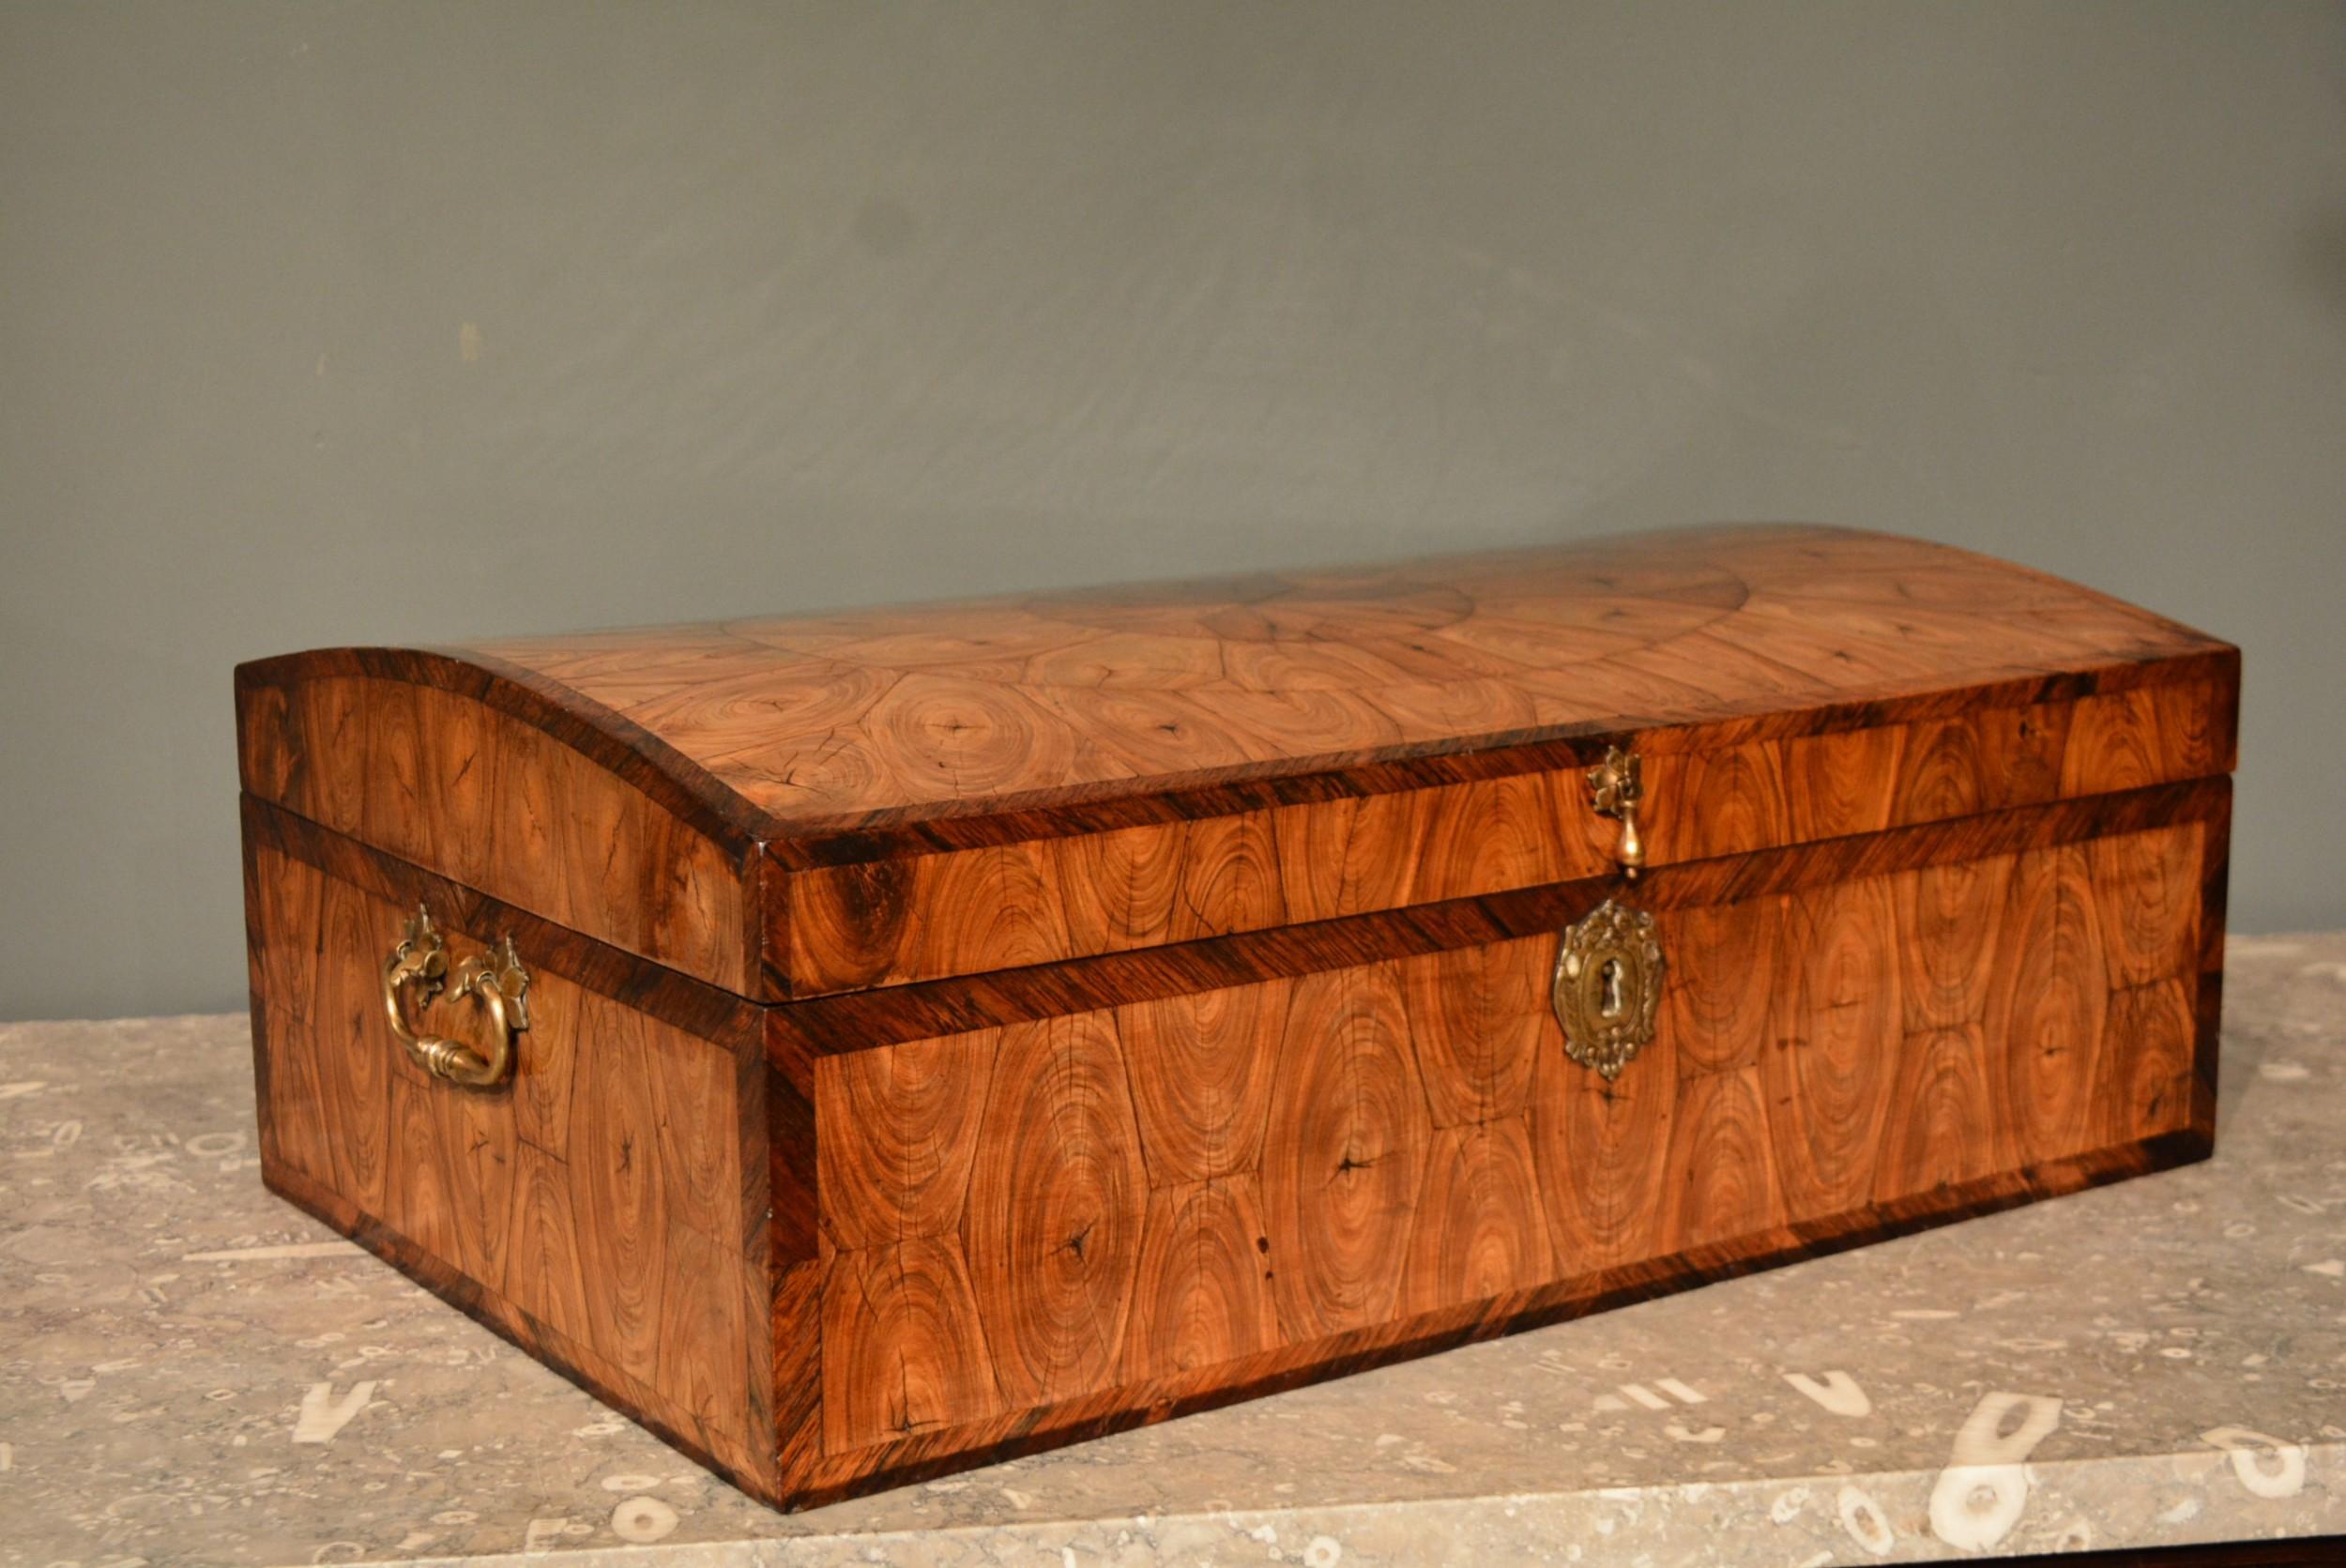 17th century kingwood oyster veneered casket